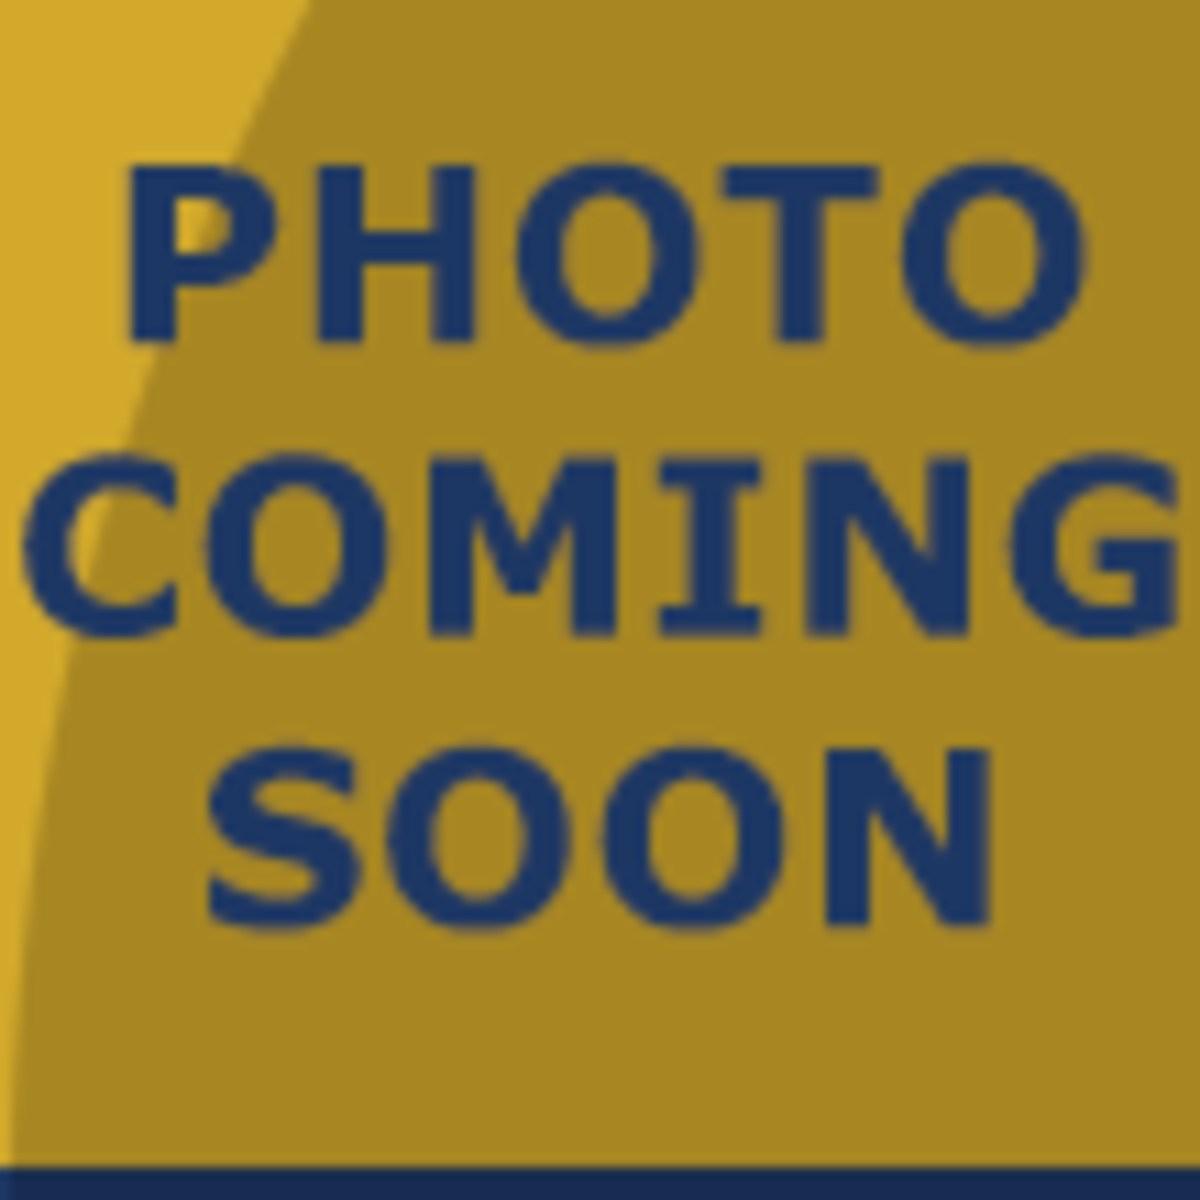 Jeff Dougherty's Profile Photo